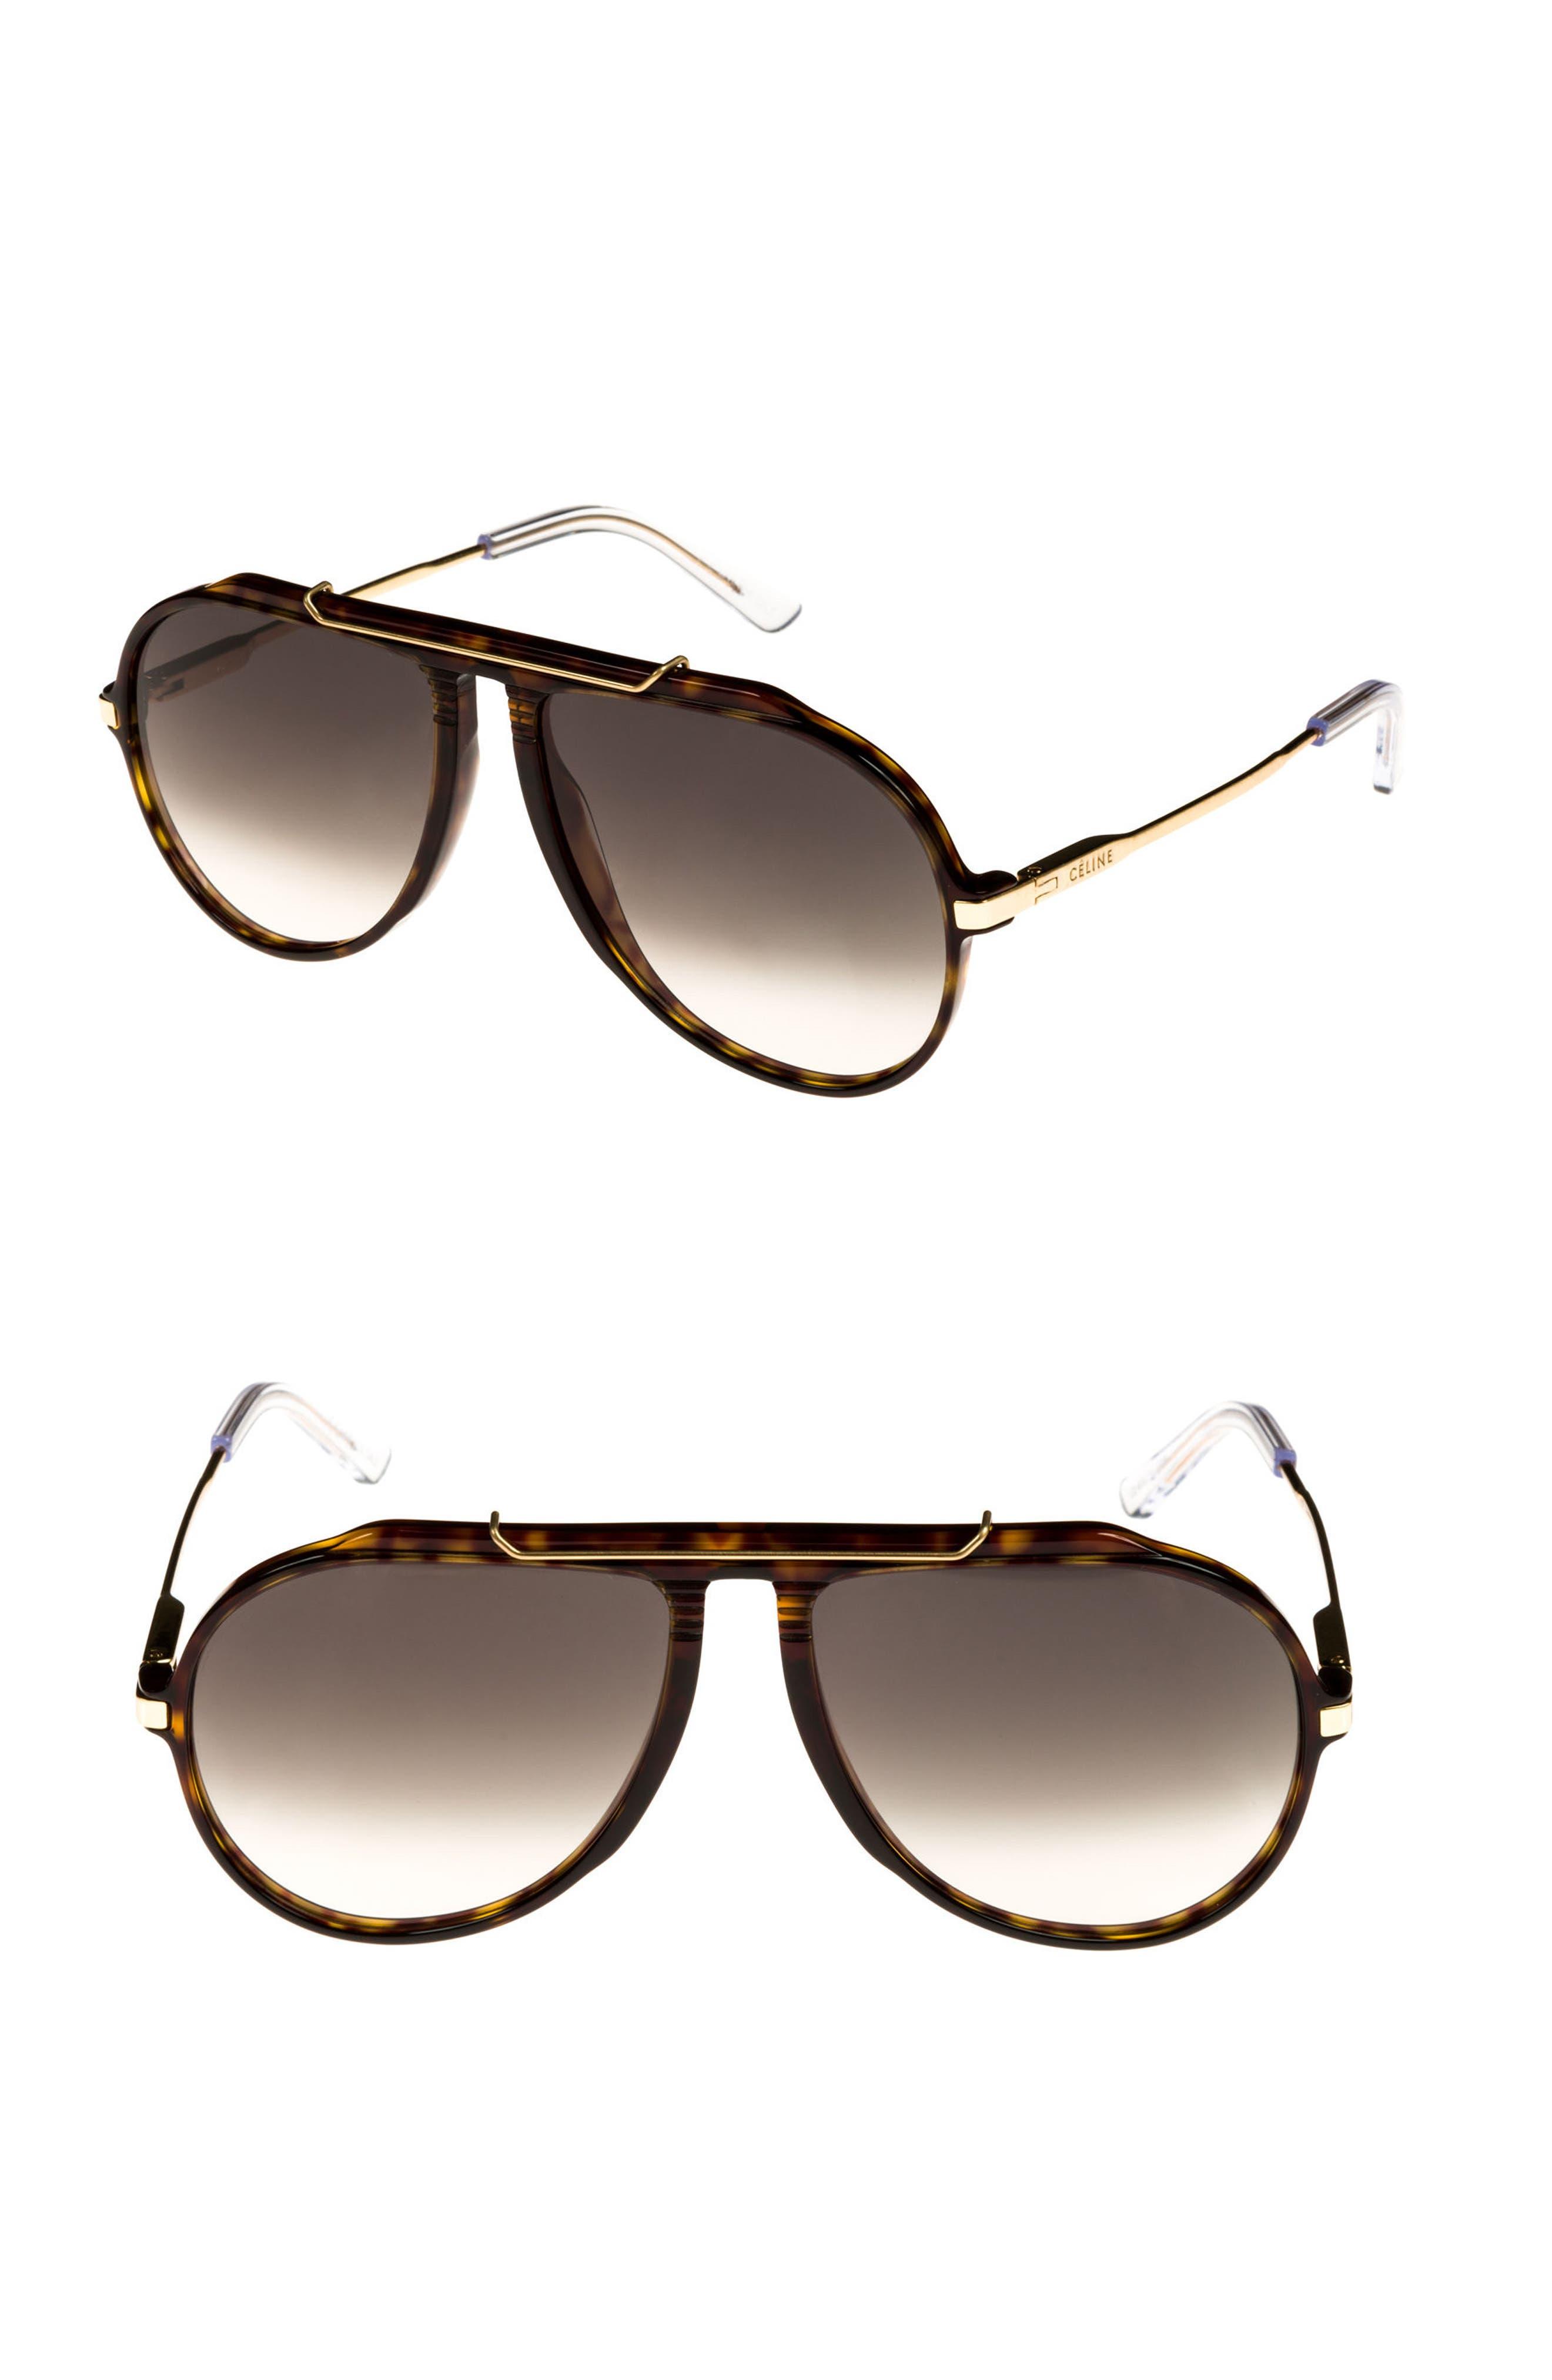 60mm Gradient Aviator Sunglasses,                             Main thumbnail 1, color,                             DARK HAVANA/ GOLD/ GREEN